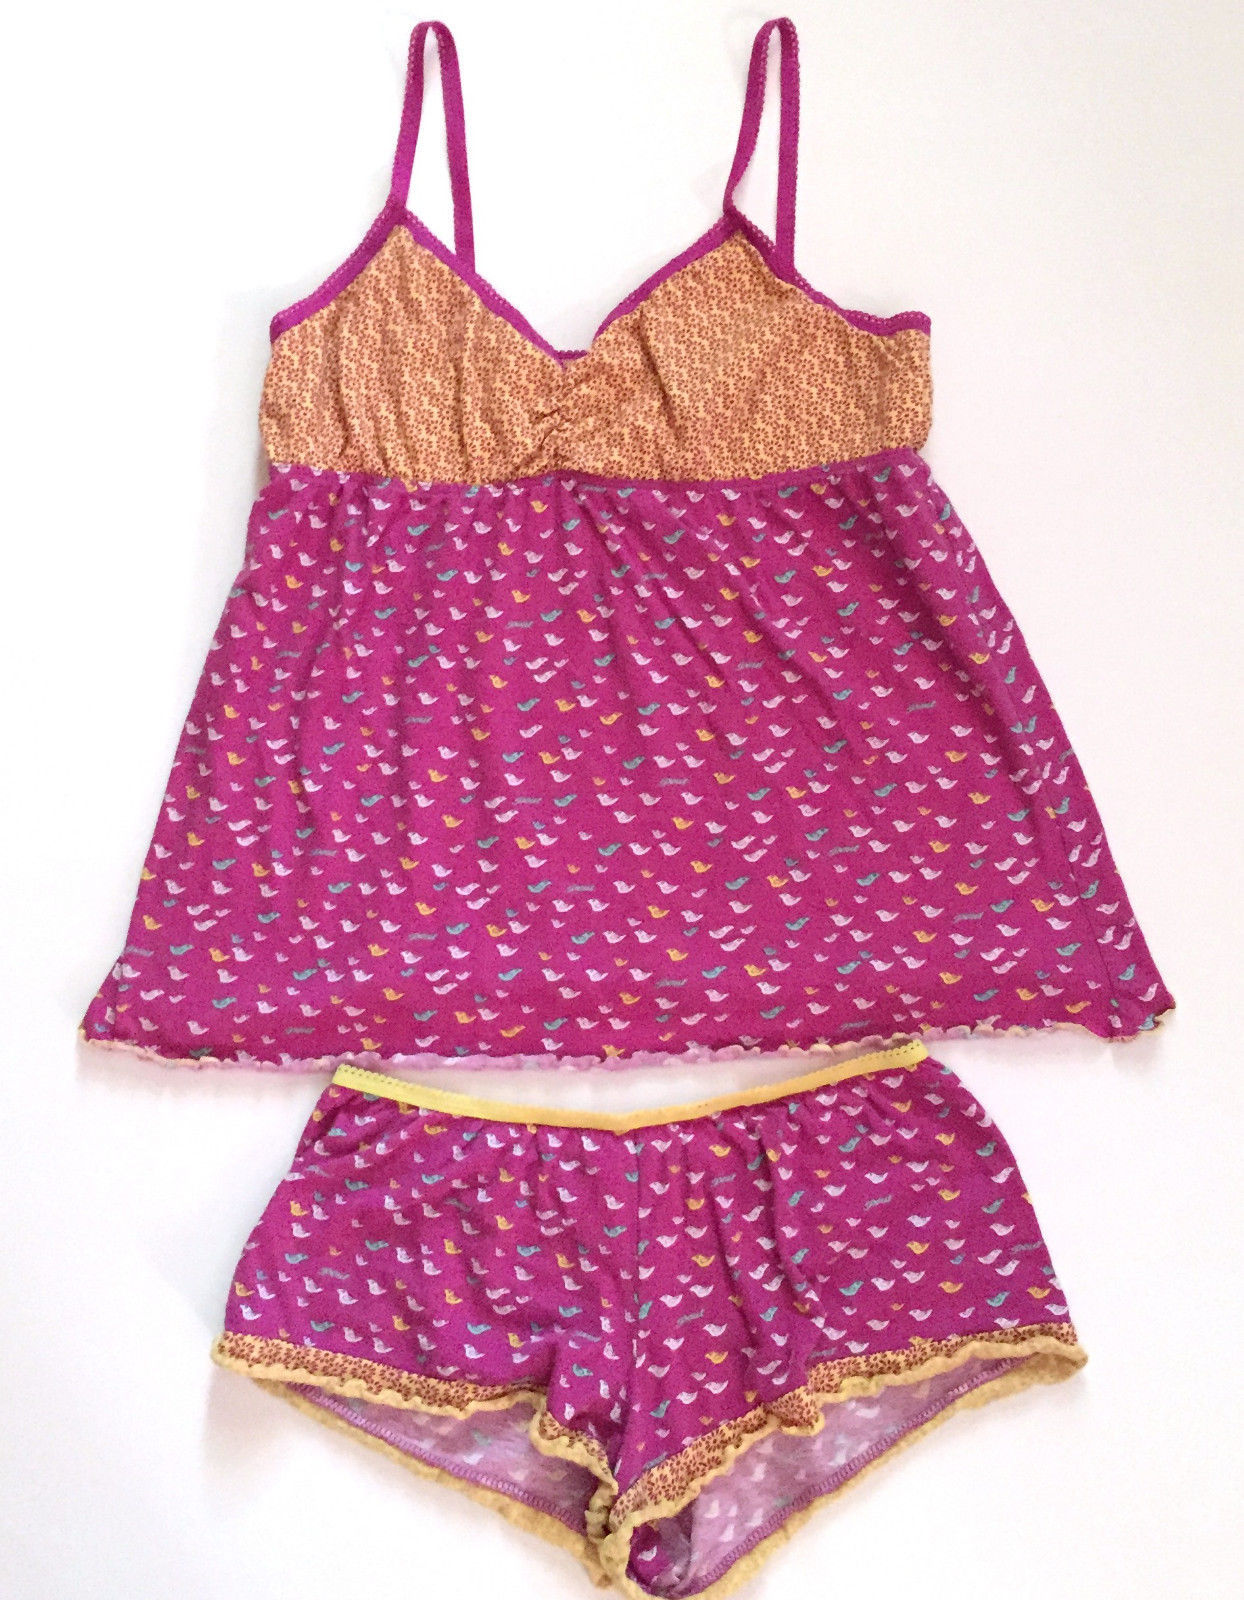 3bdf92bea56 Victoria s Secret Pout M Baby Doll Teddy Boy and 50 similar items. 57